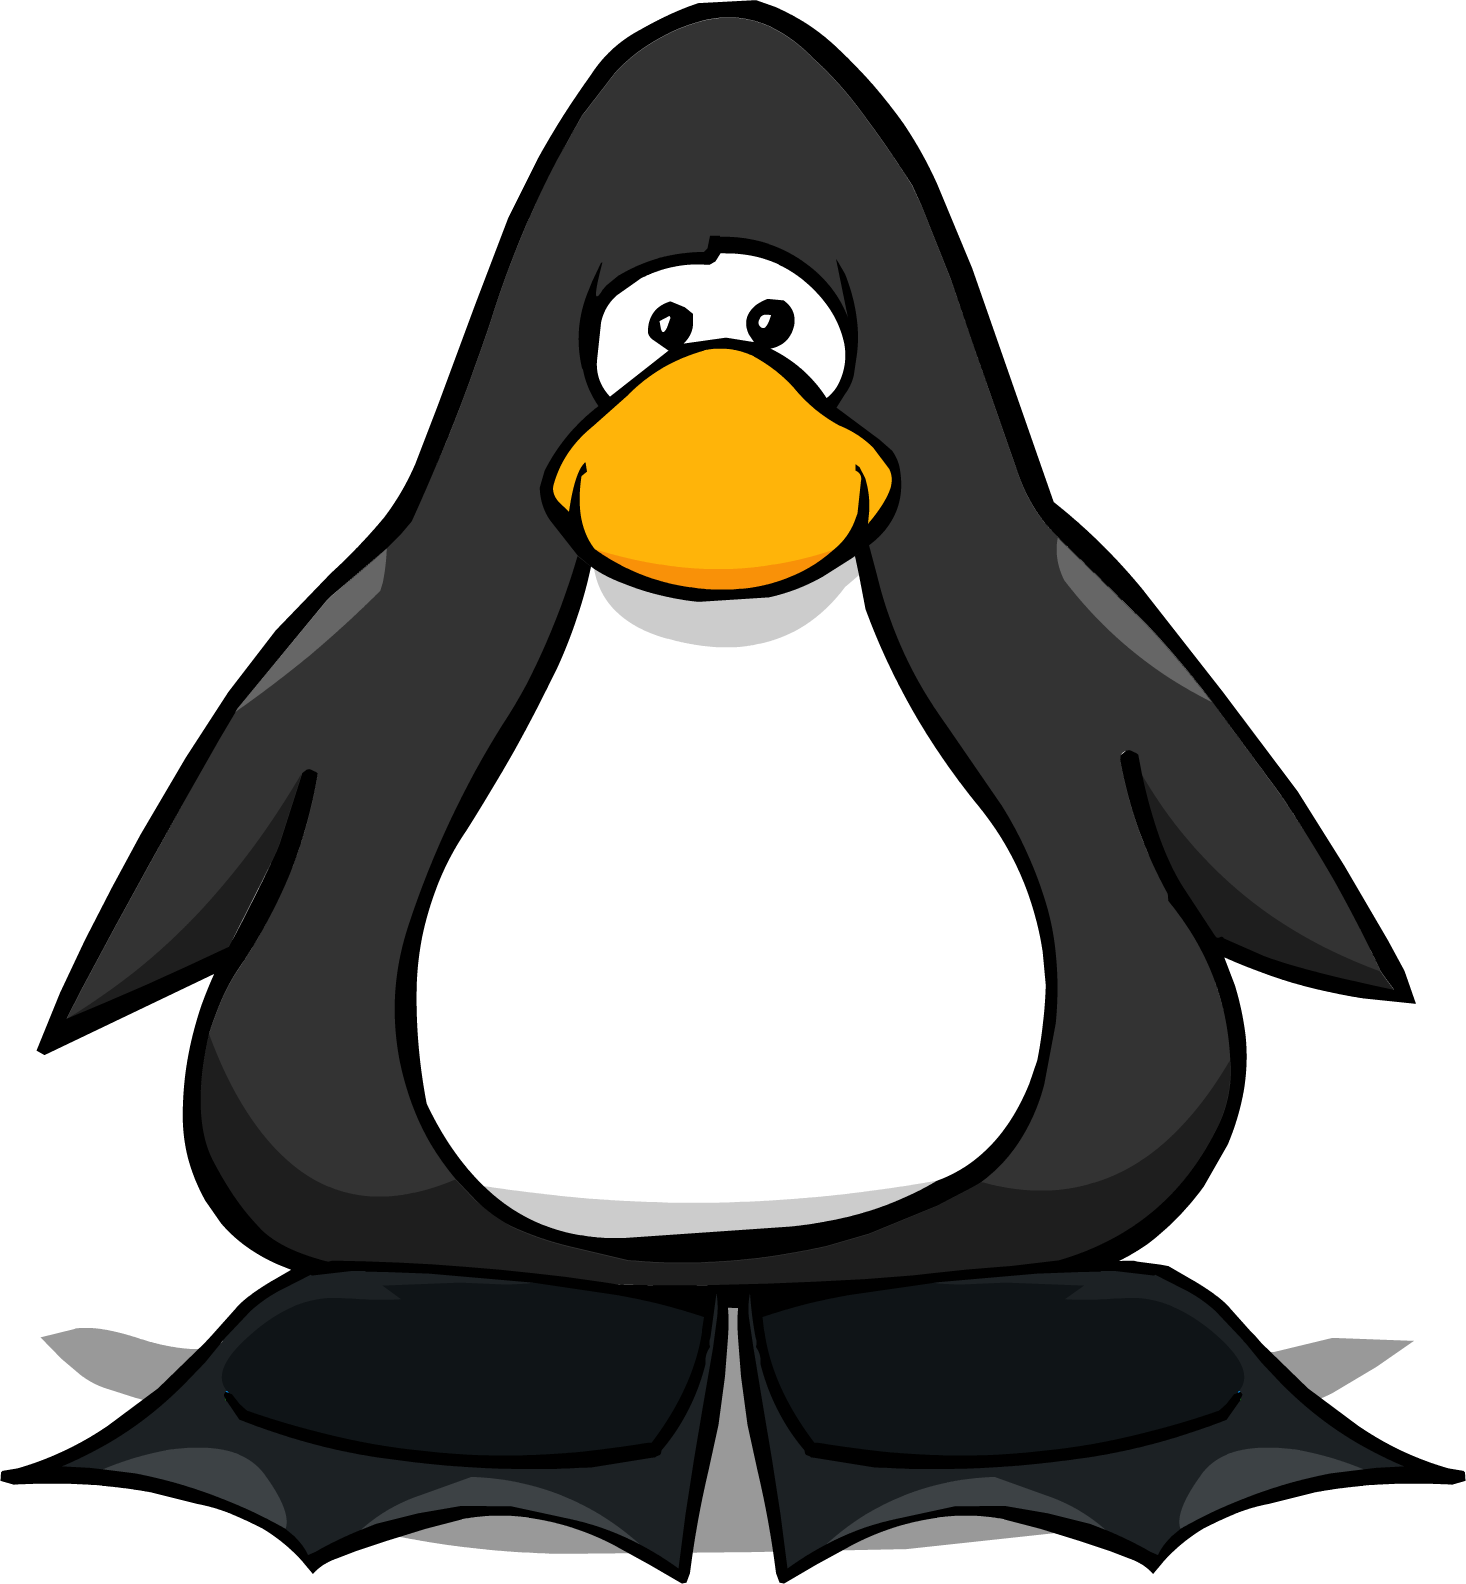 Image black flippers pc. Clipart penquin penguin flipper